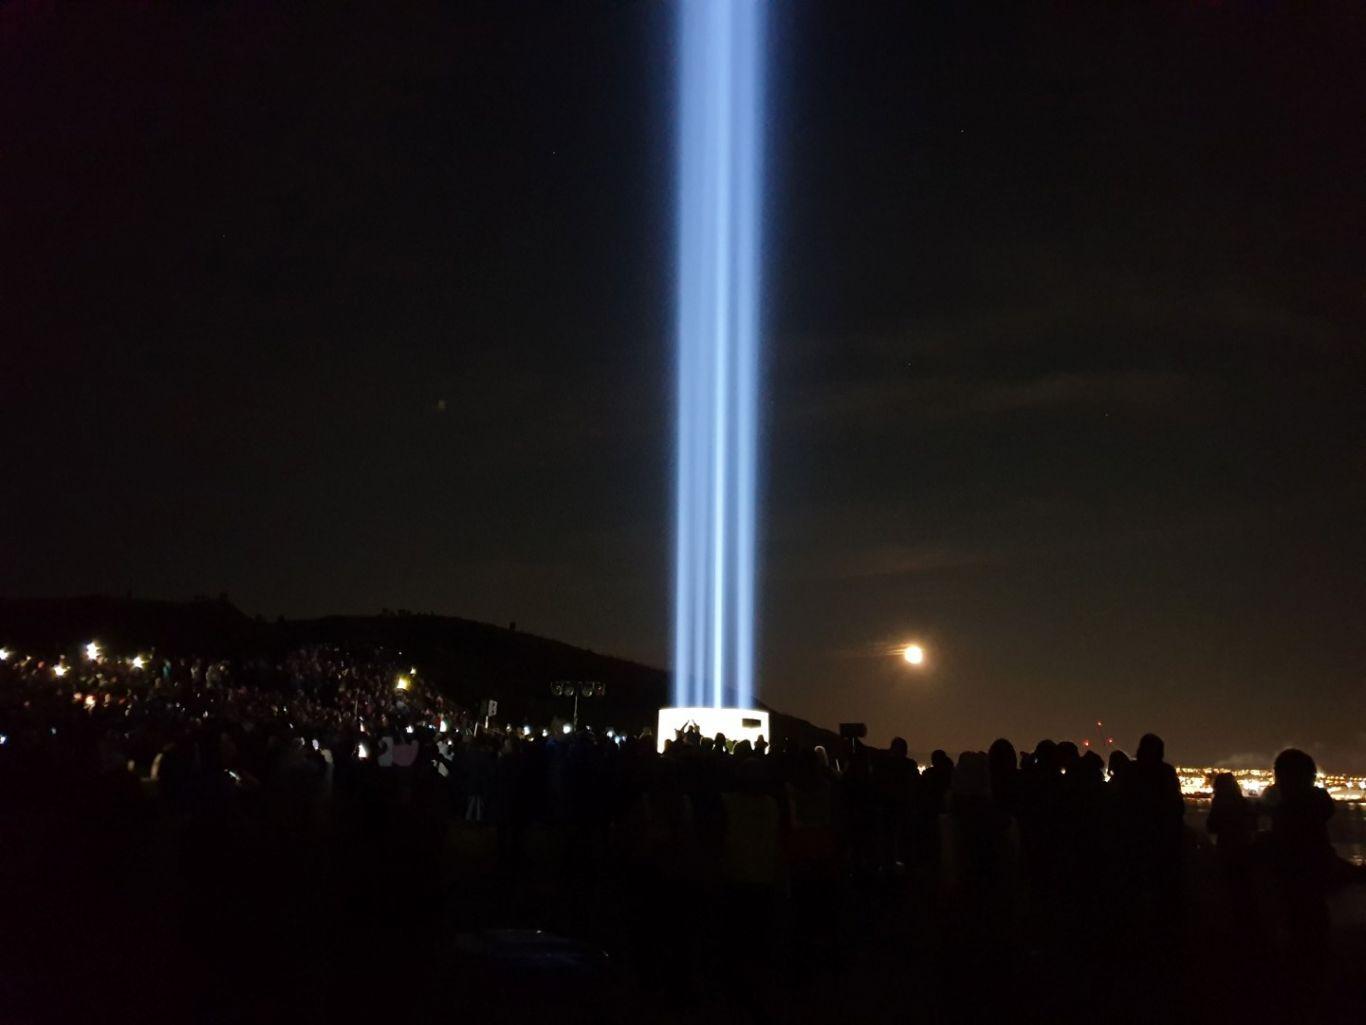 Imagine Peace Tower in Viðey by Yoko Ono, 2007.